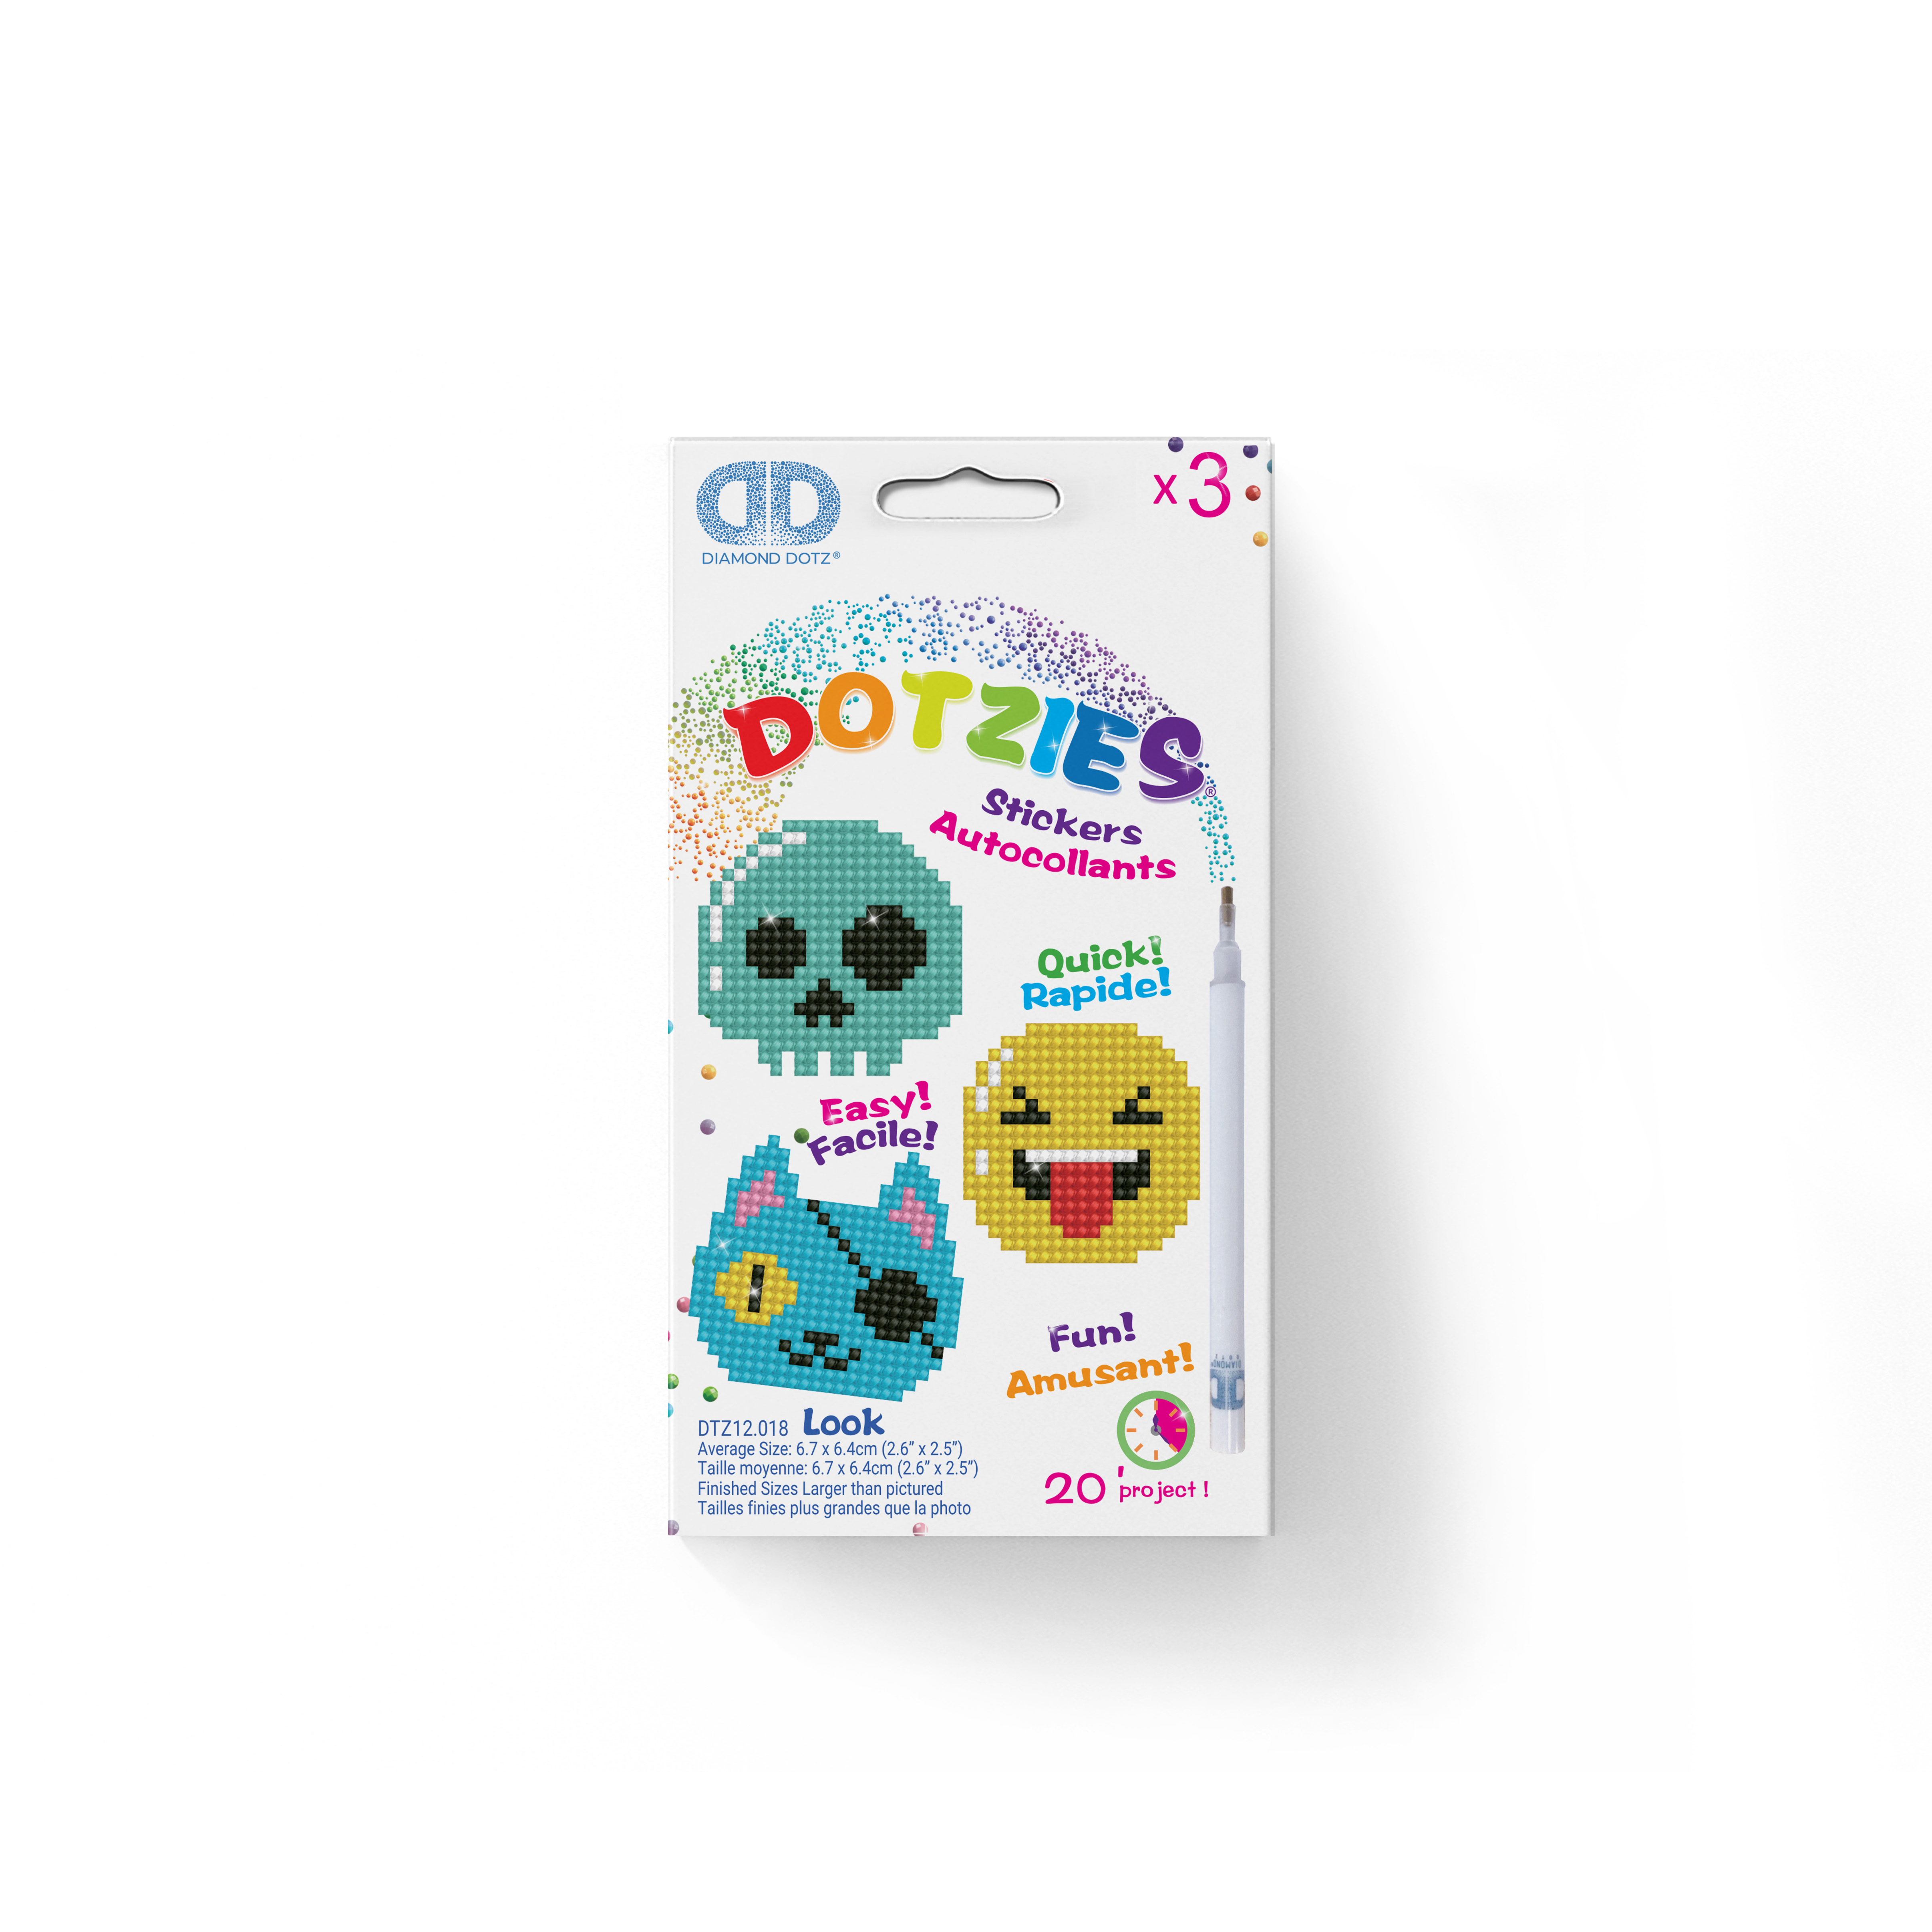 DTZ12.018_packaging